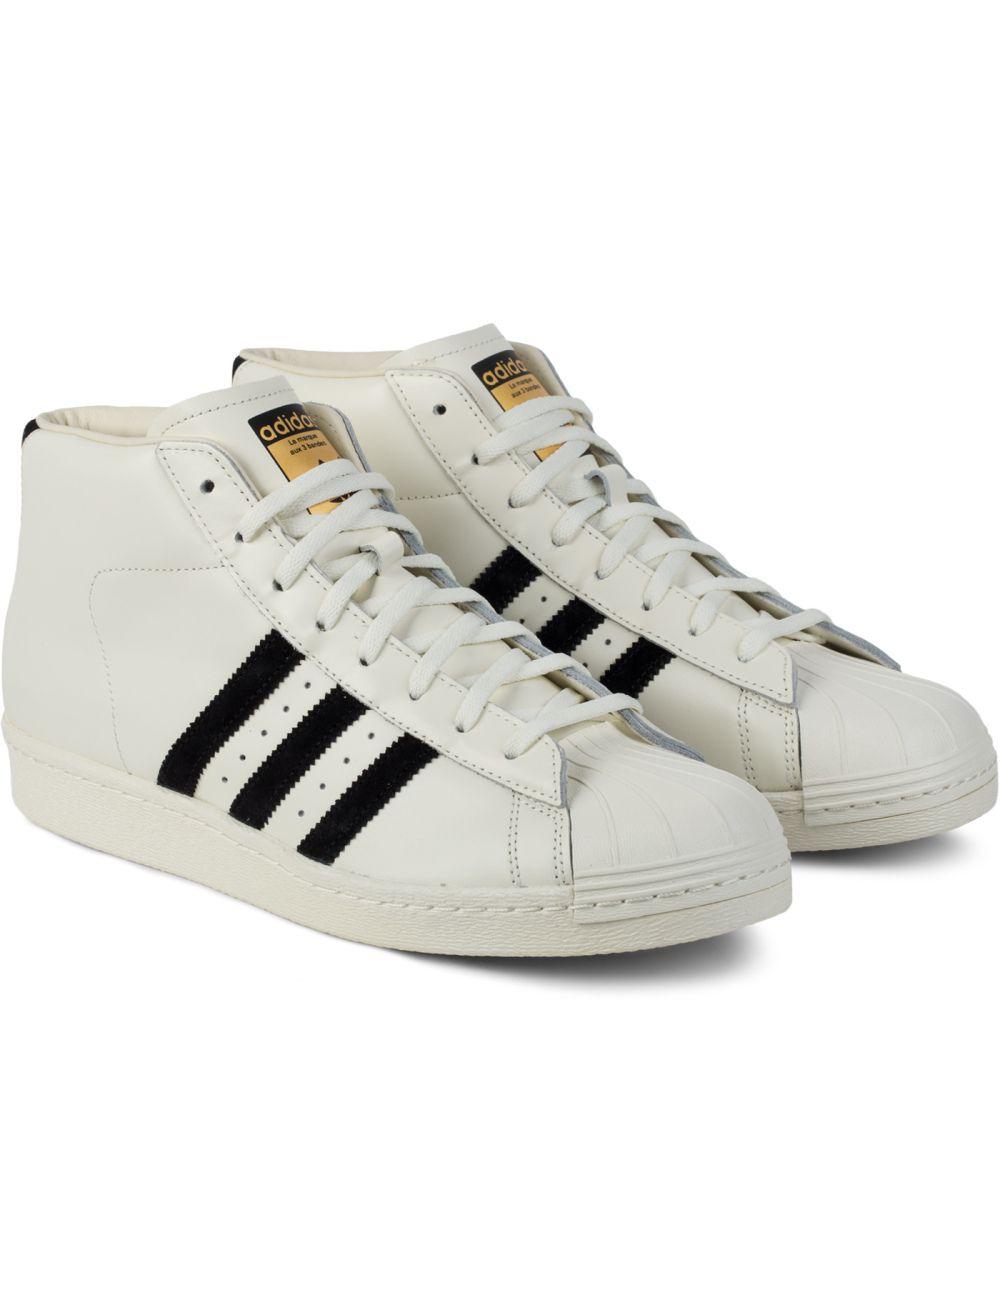 Off White/Core Black/Off White B35246 Pro Model Vintage DLX Shoes